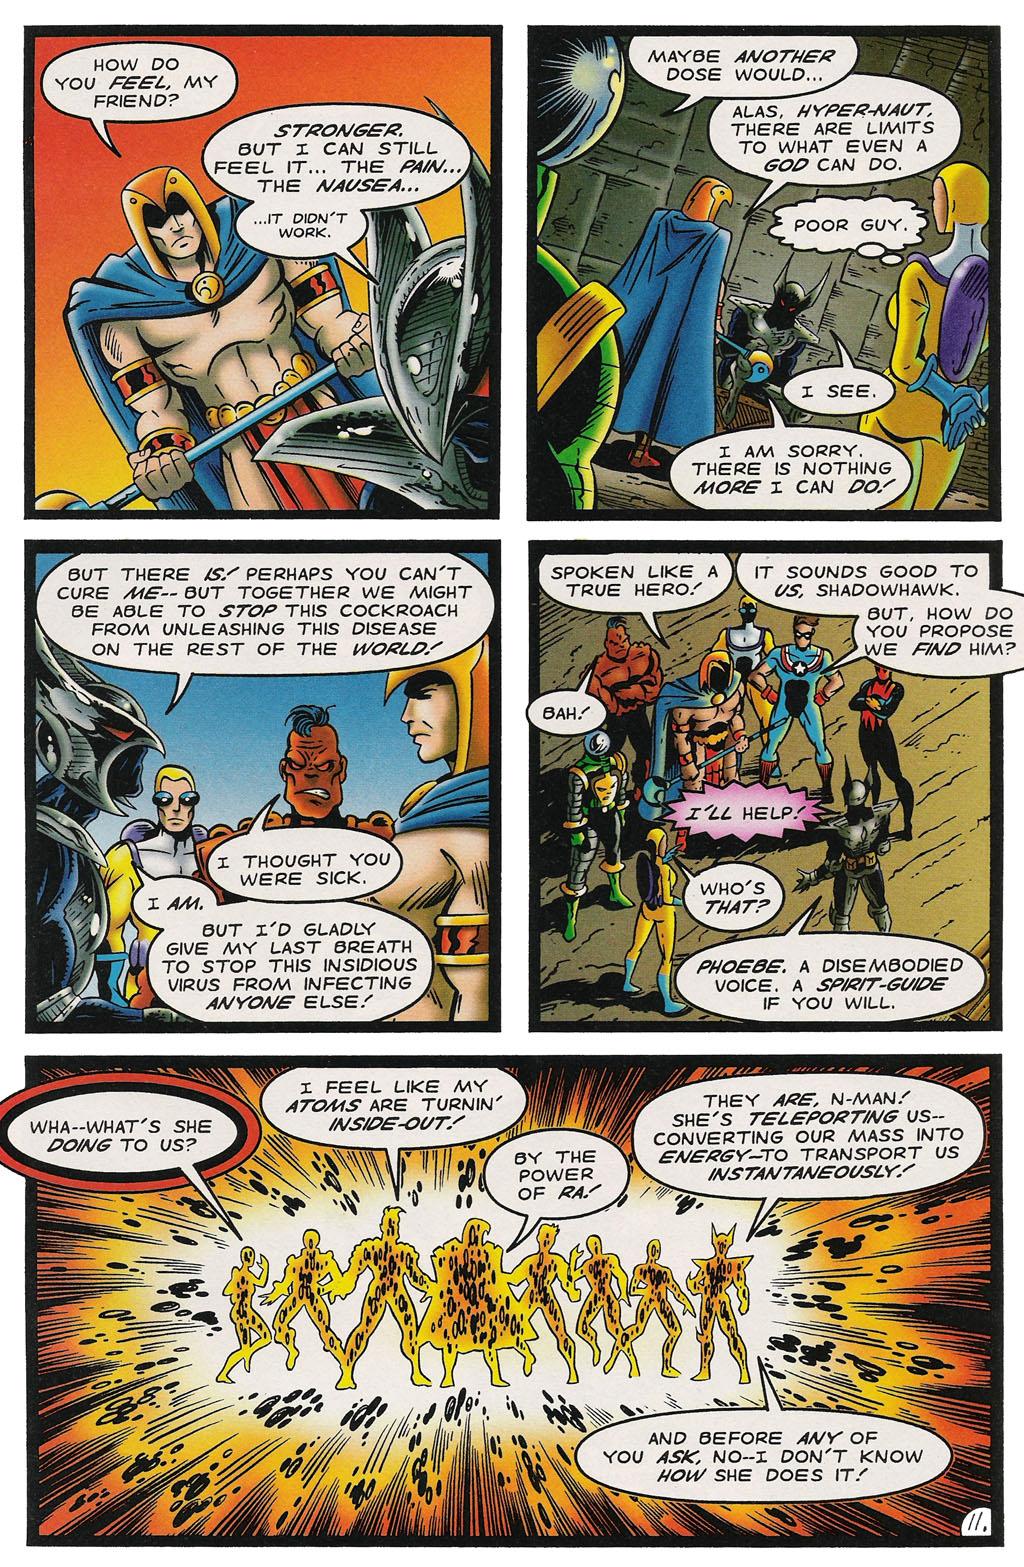 Read online ShadowHawk comic -  Issue #14 - 12